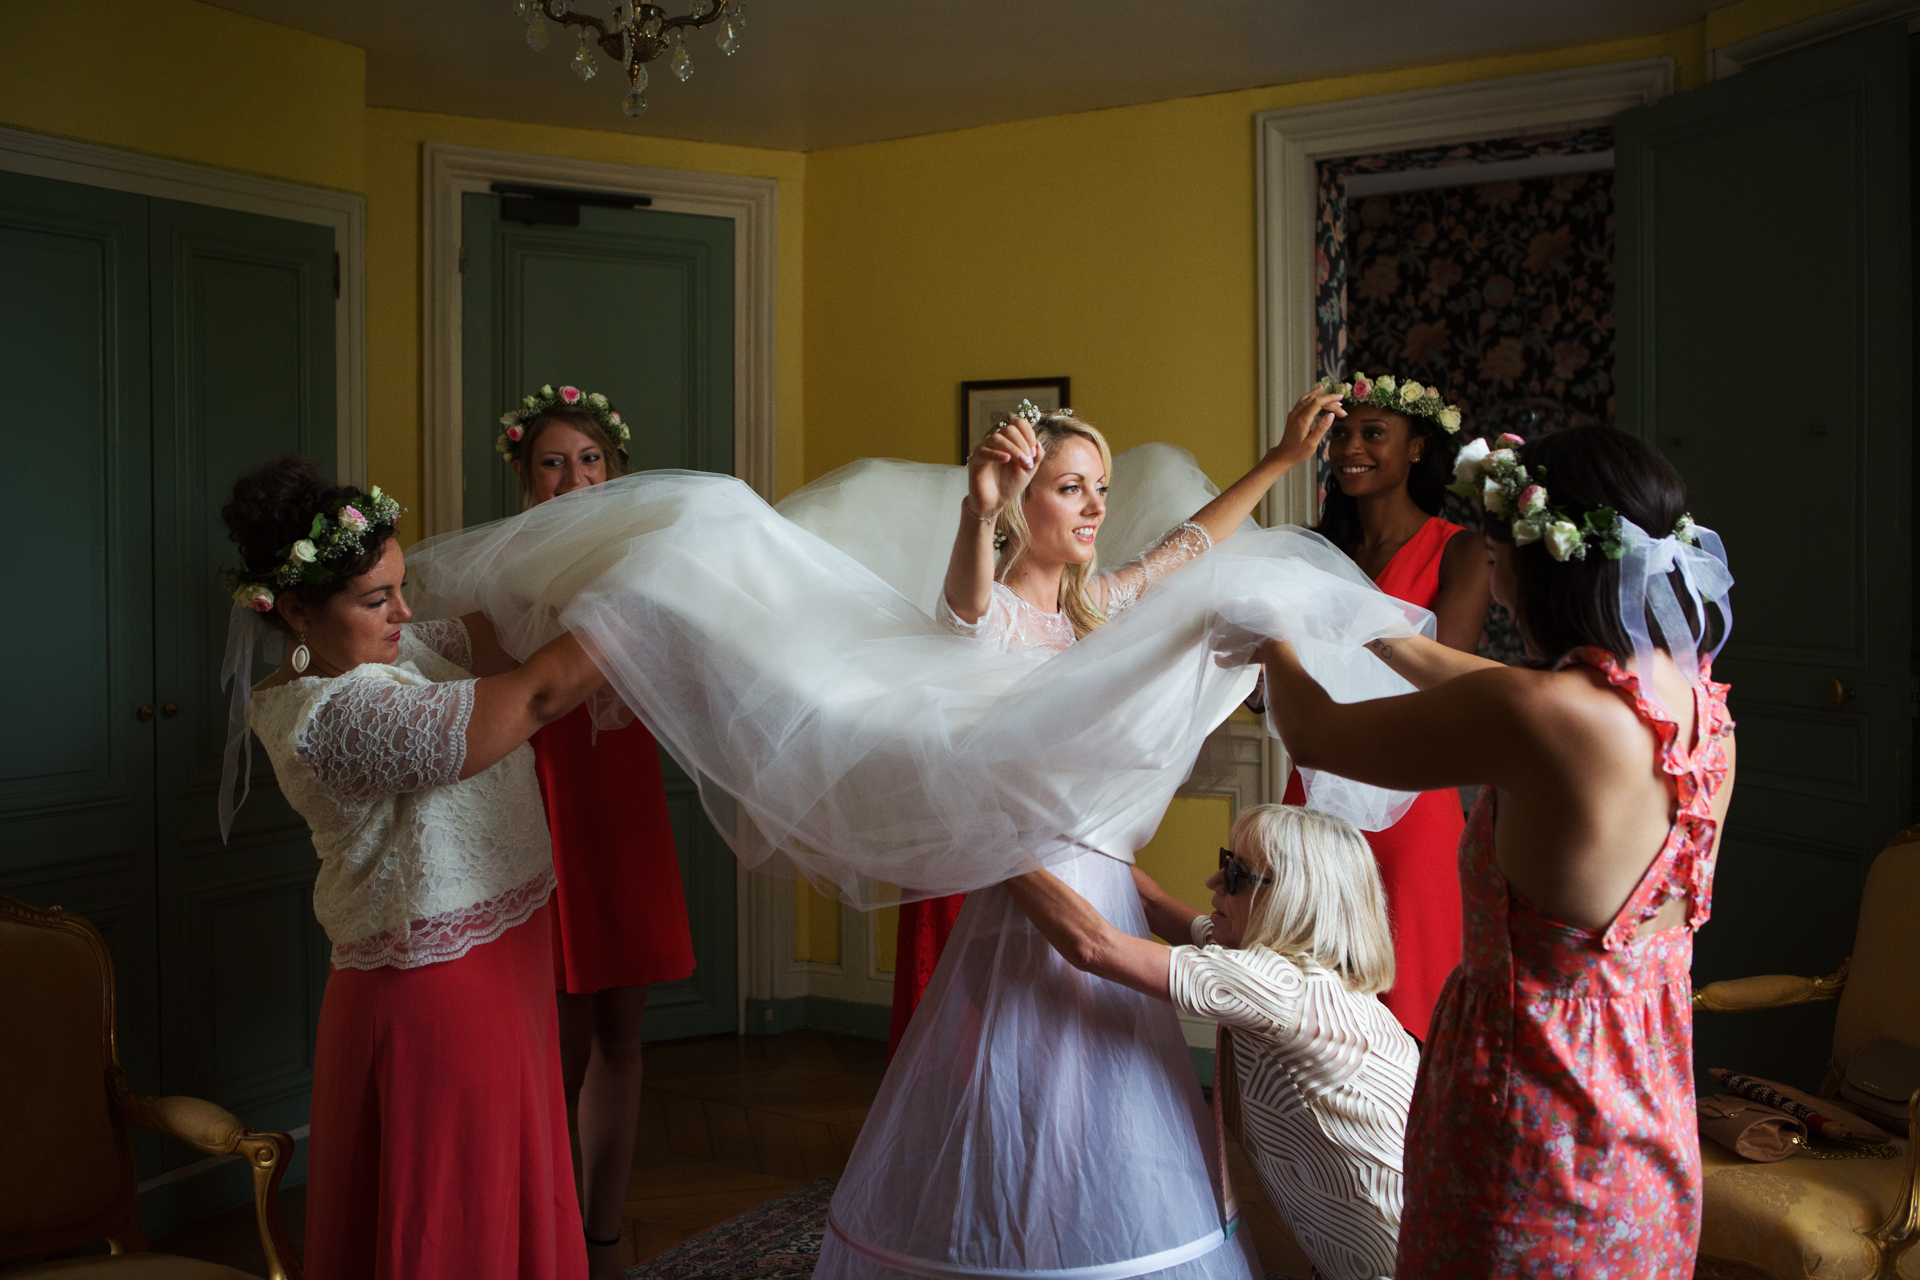 photographe-mariage-oise-paris-chantilly-senlis-keith-flament0003